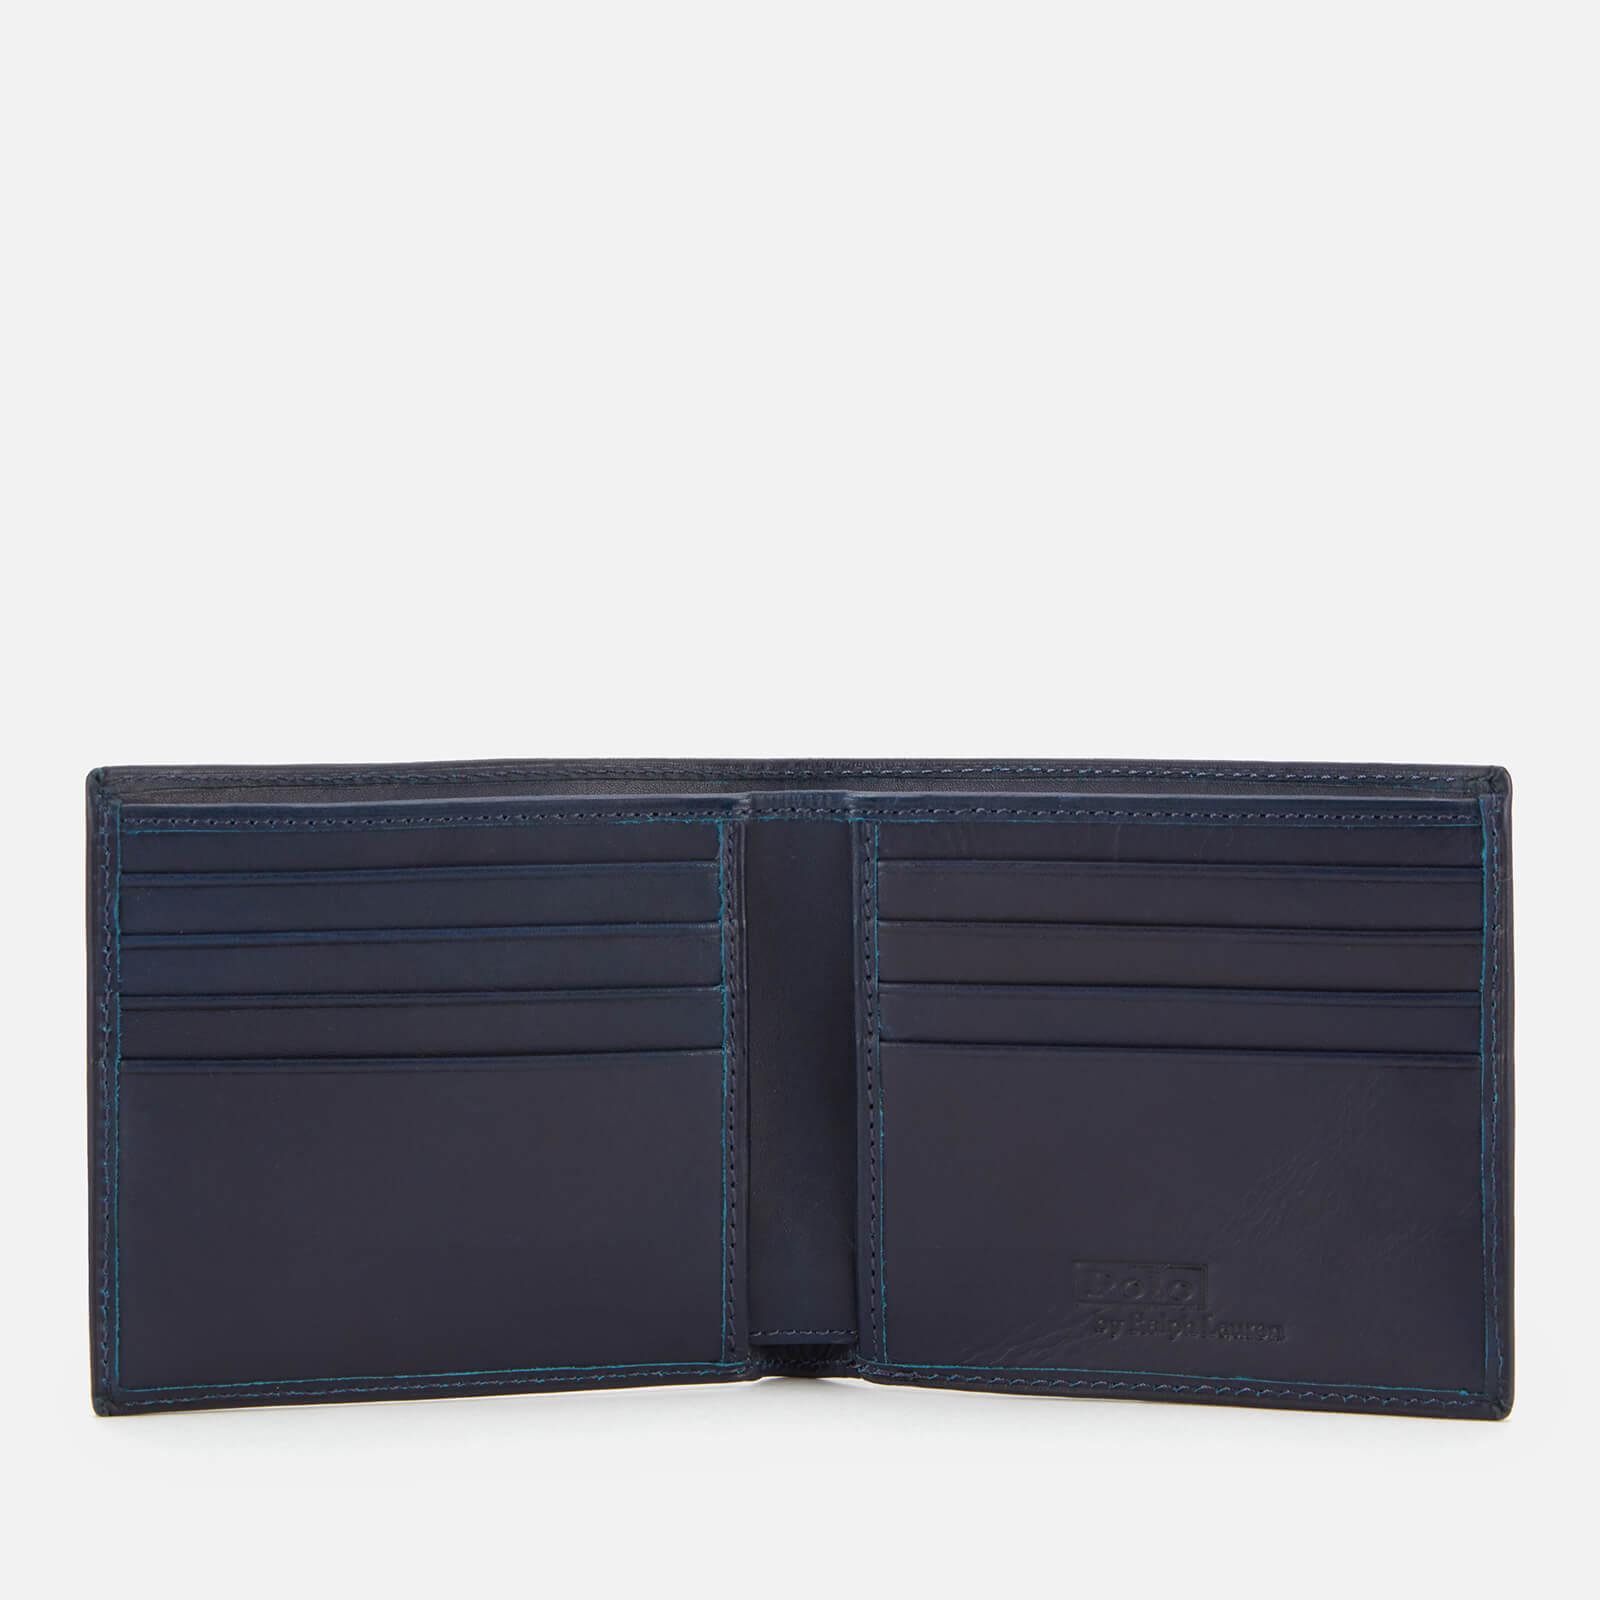 polo ralph lauren men's smooth leather bear logo wallet - navy